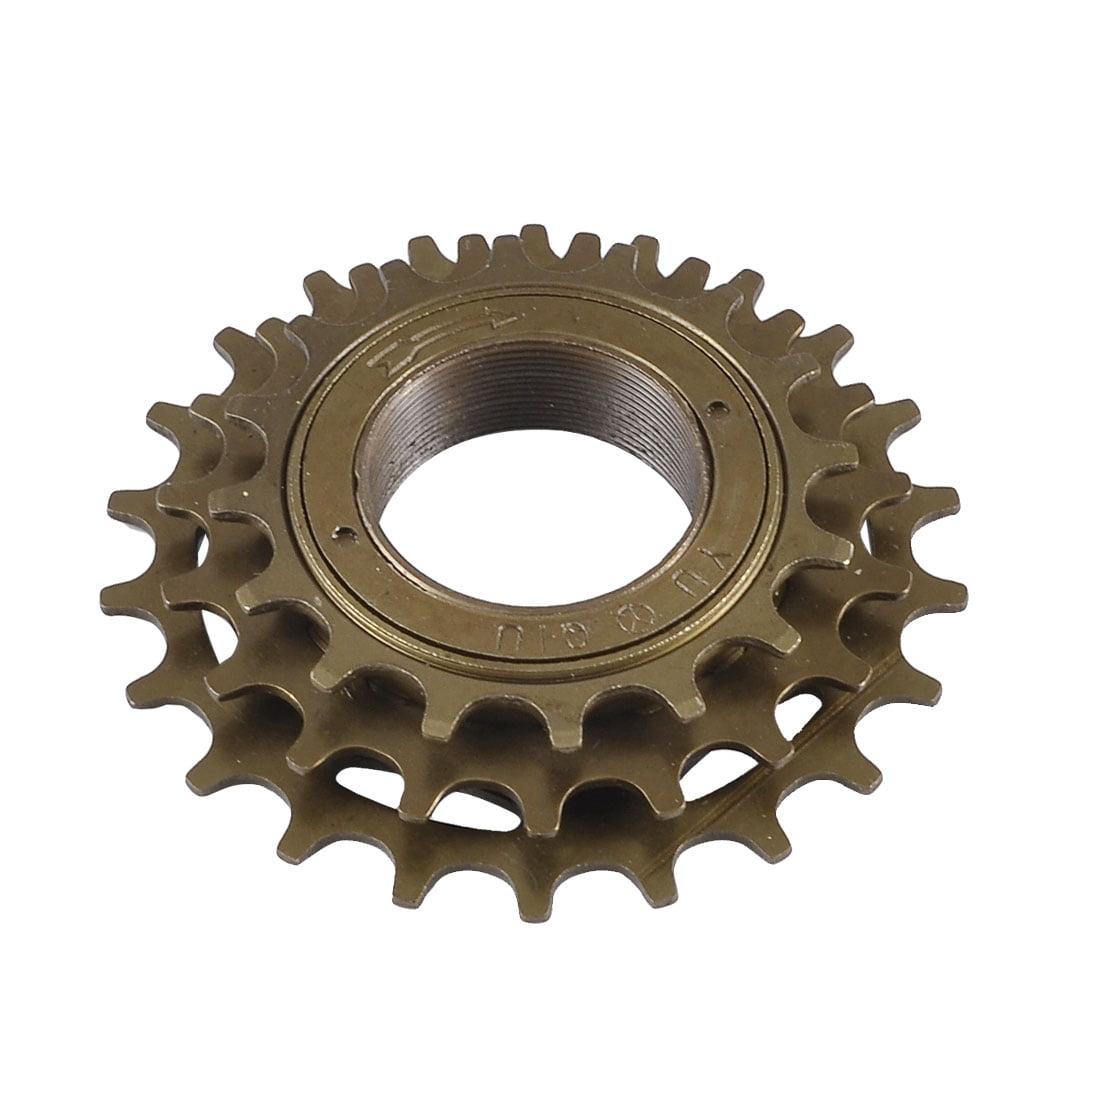 Metal Three Speed Sprocket Threaded Freewheel for Racing Bicycle